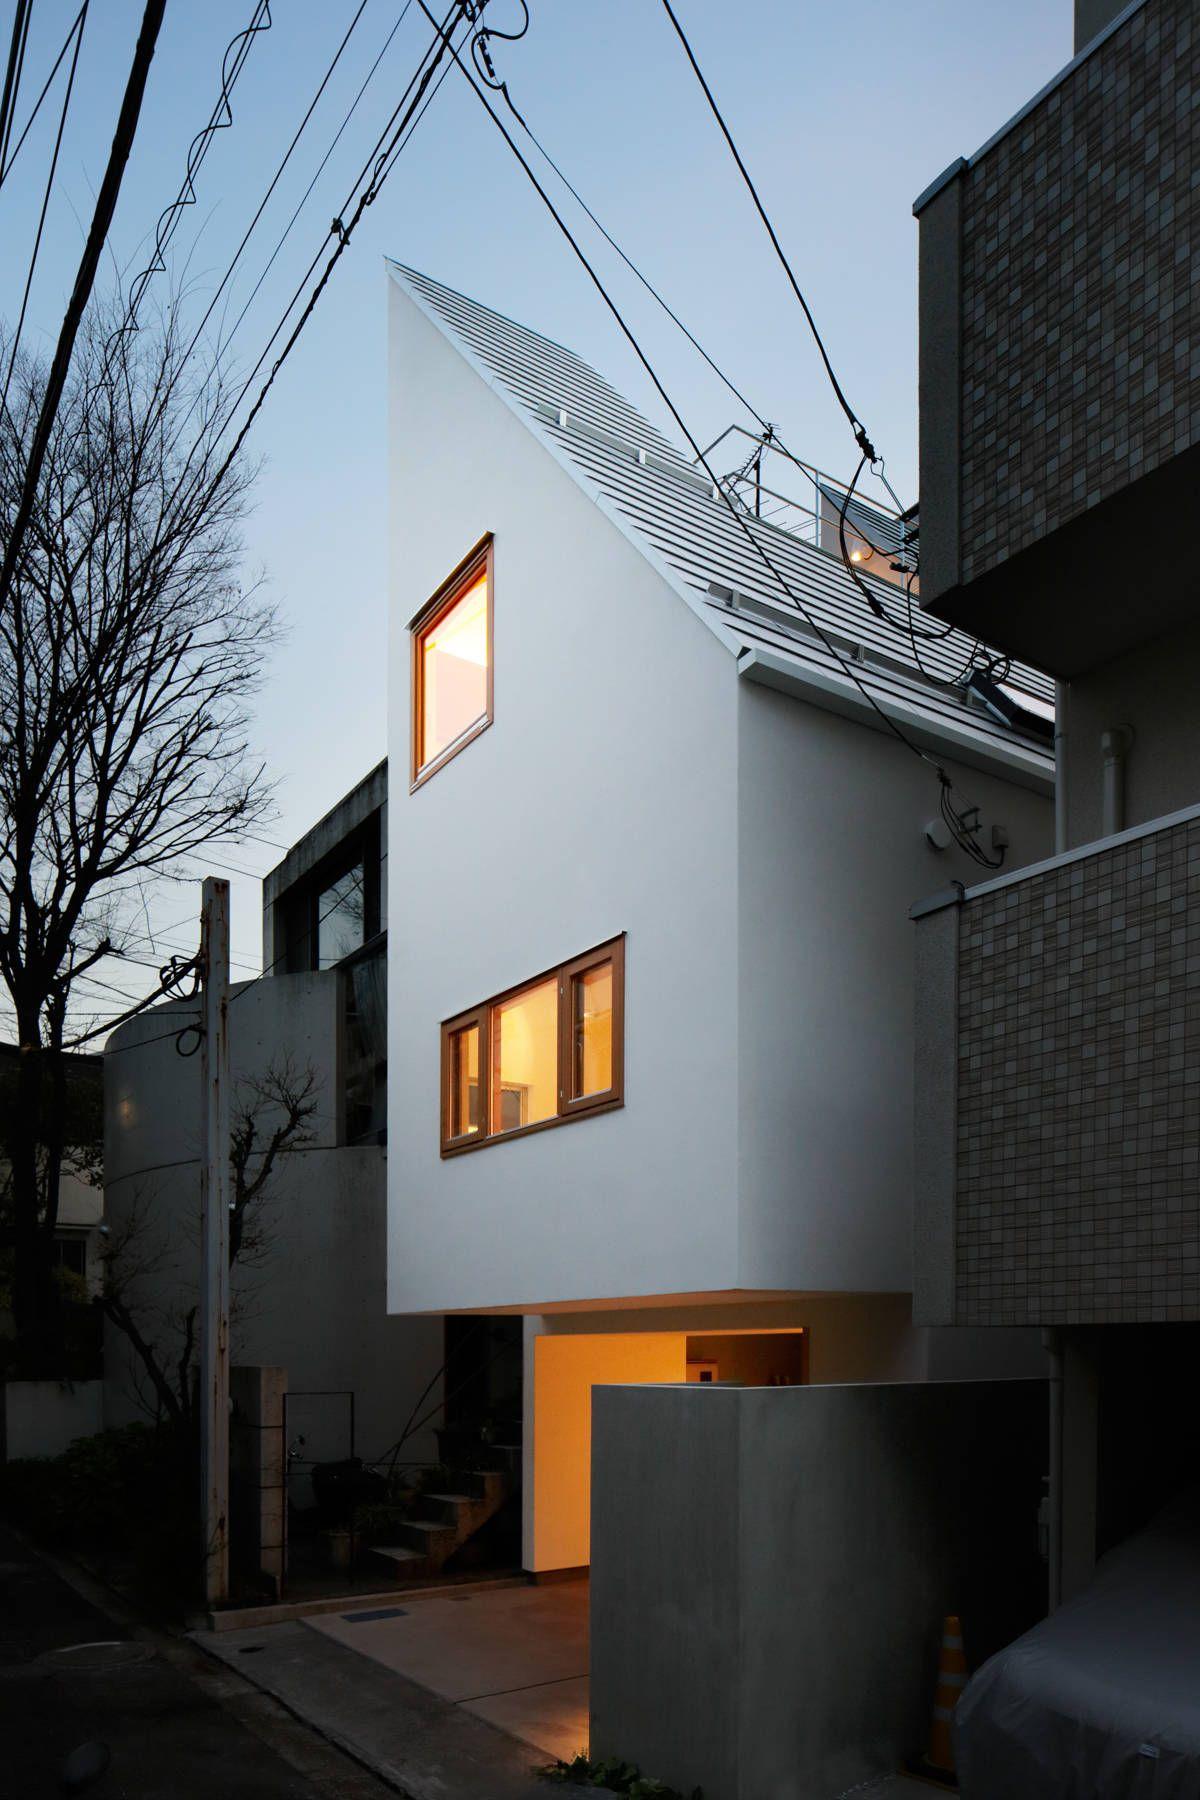 Facade House, Minimalist Architecture